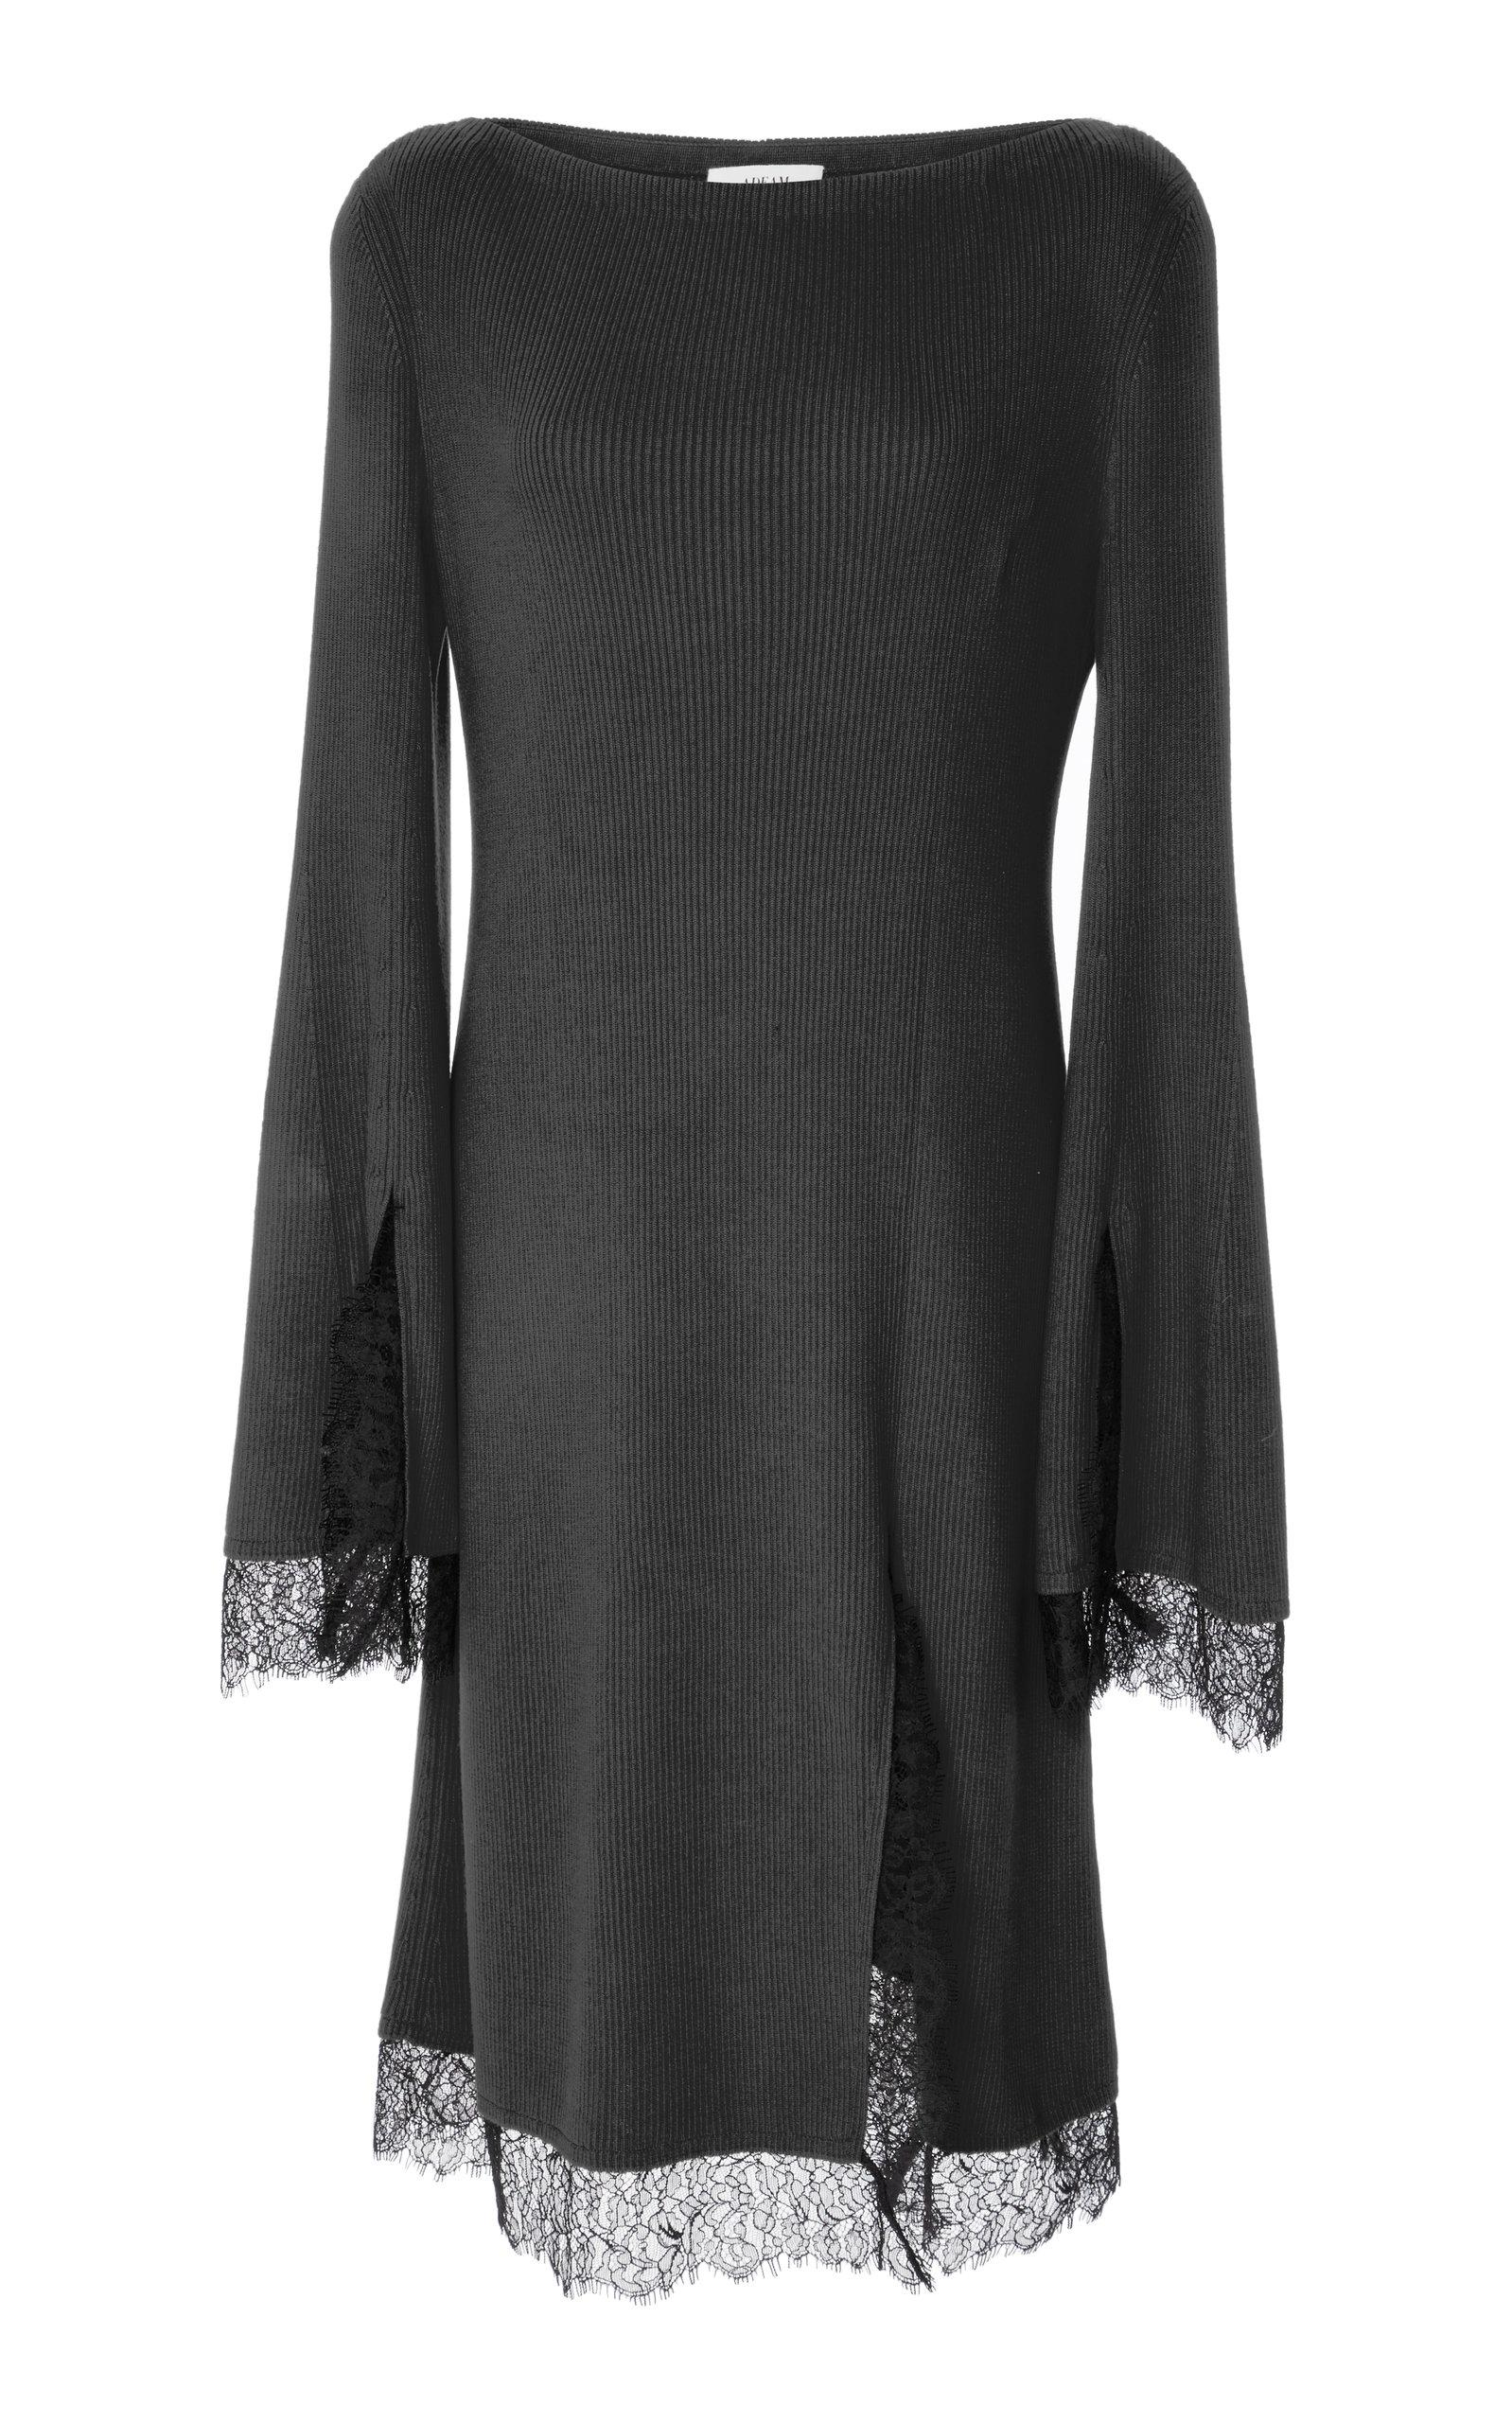 Adeam Lace Trimmed Slit Knit Dress In Black